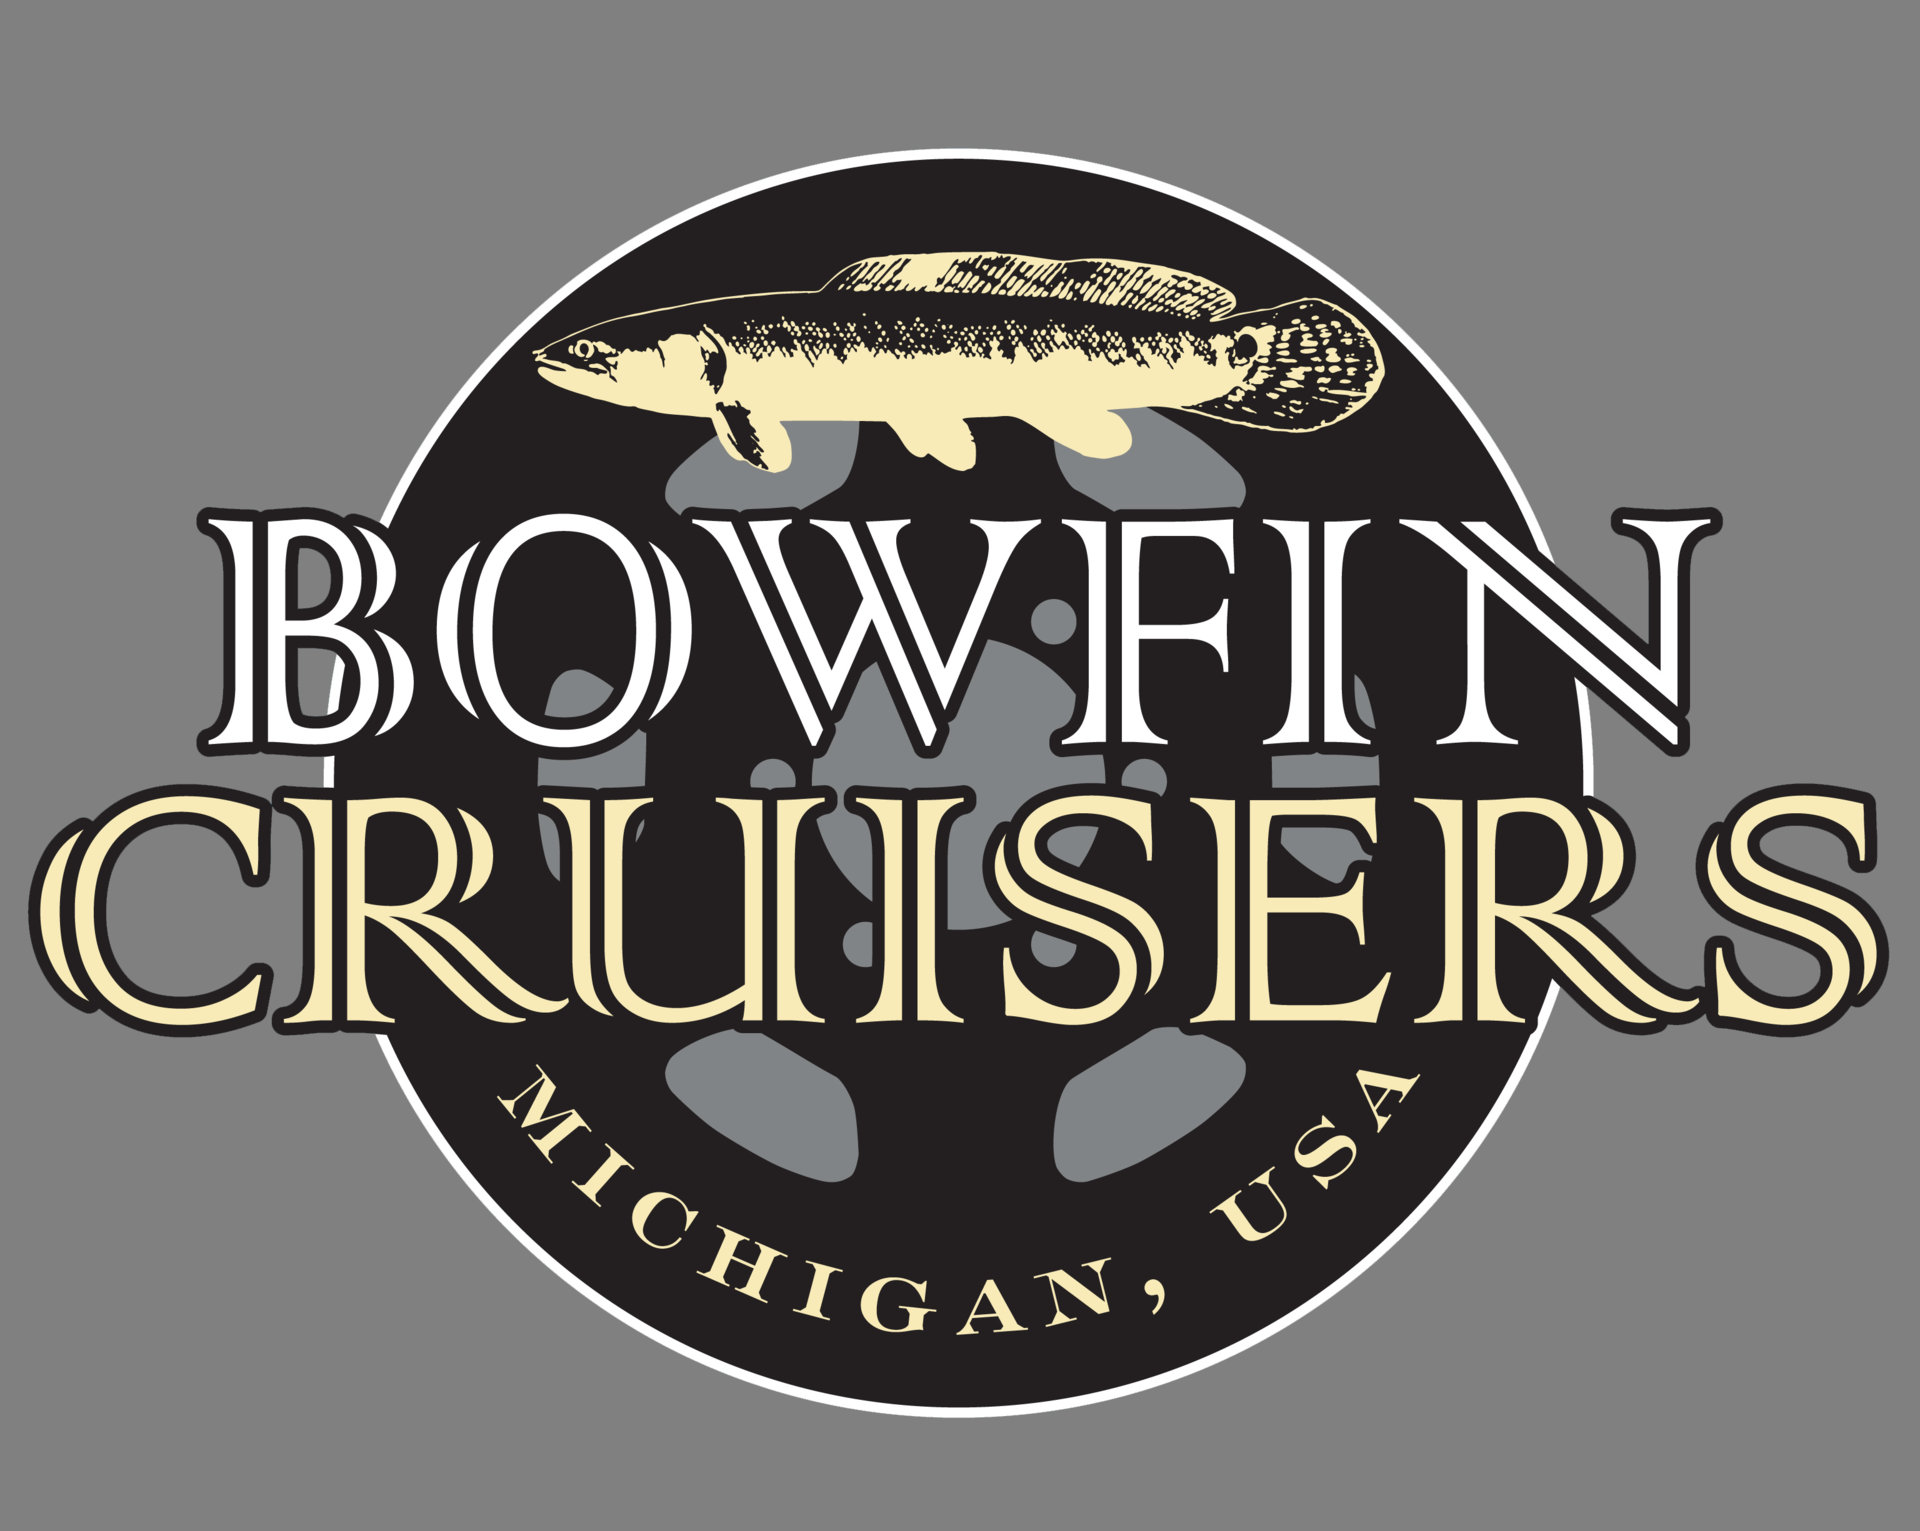 Bowfin_logo_FINAL_2017 (1).jpg